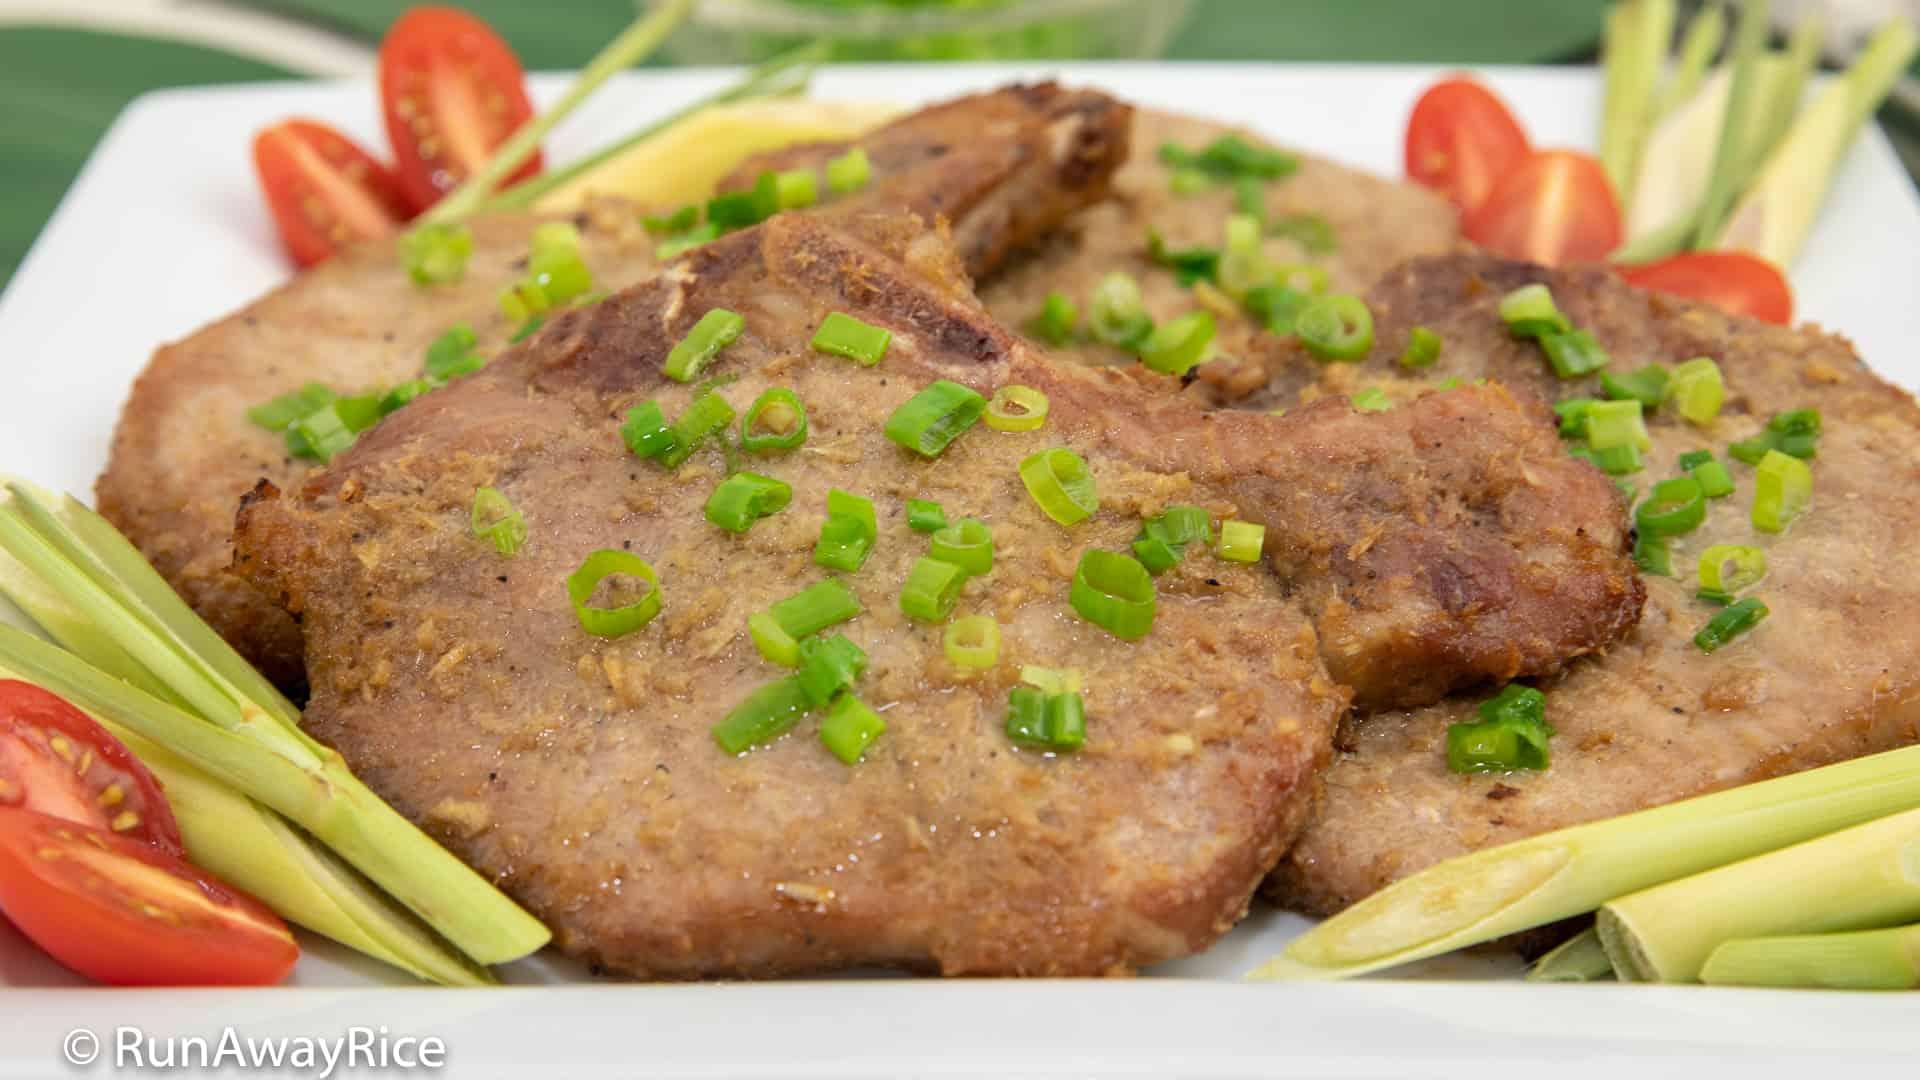 Grilled Lemongrass Pork Chops (Suon Nuong Xa) - Restaurant Recipe Revealed | recipe from runawayrice.com